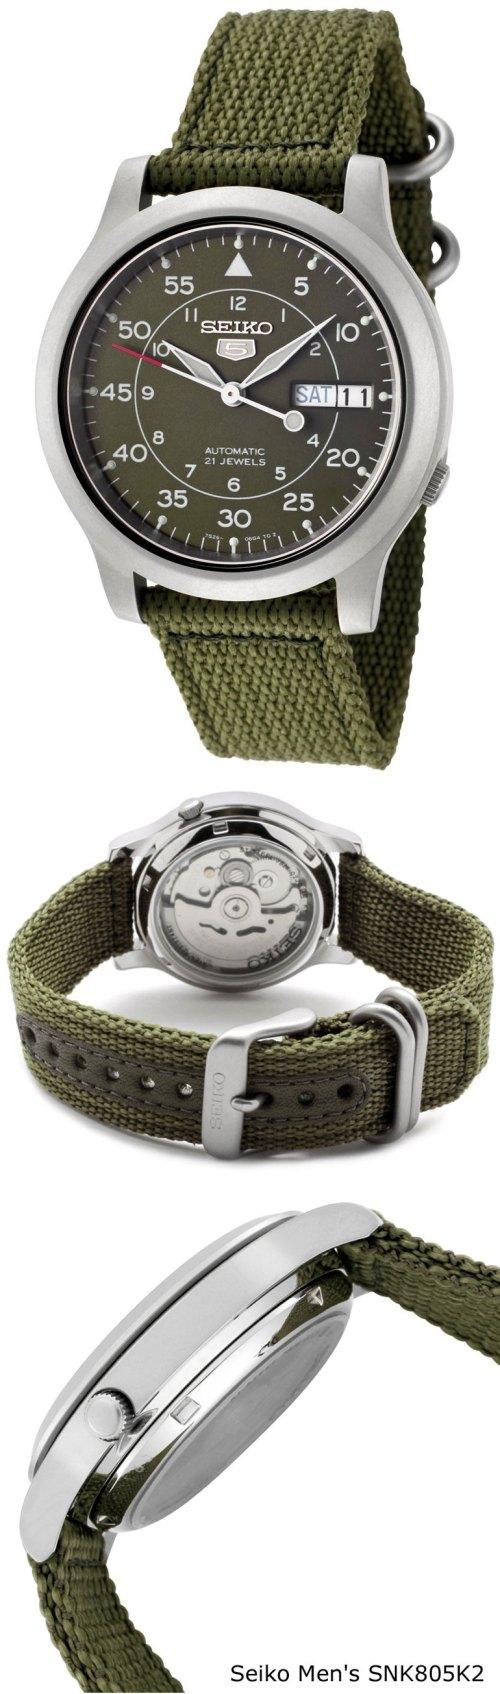 Seiko Men's SNK805K2 Automatic Green Dial Green Fabric Strap Watch